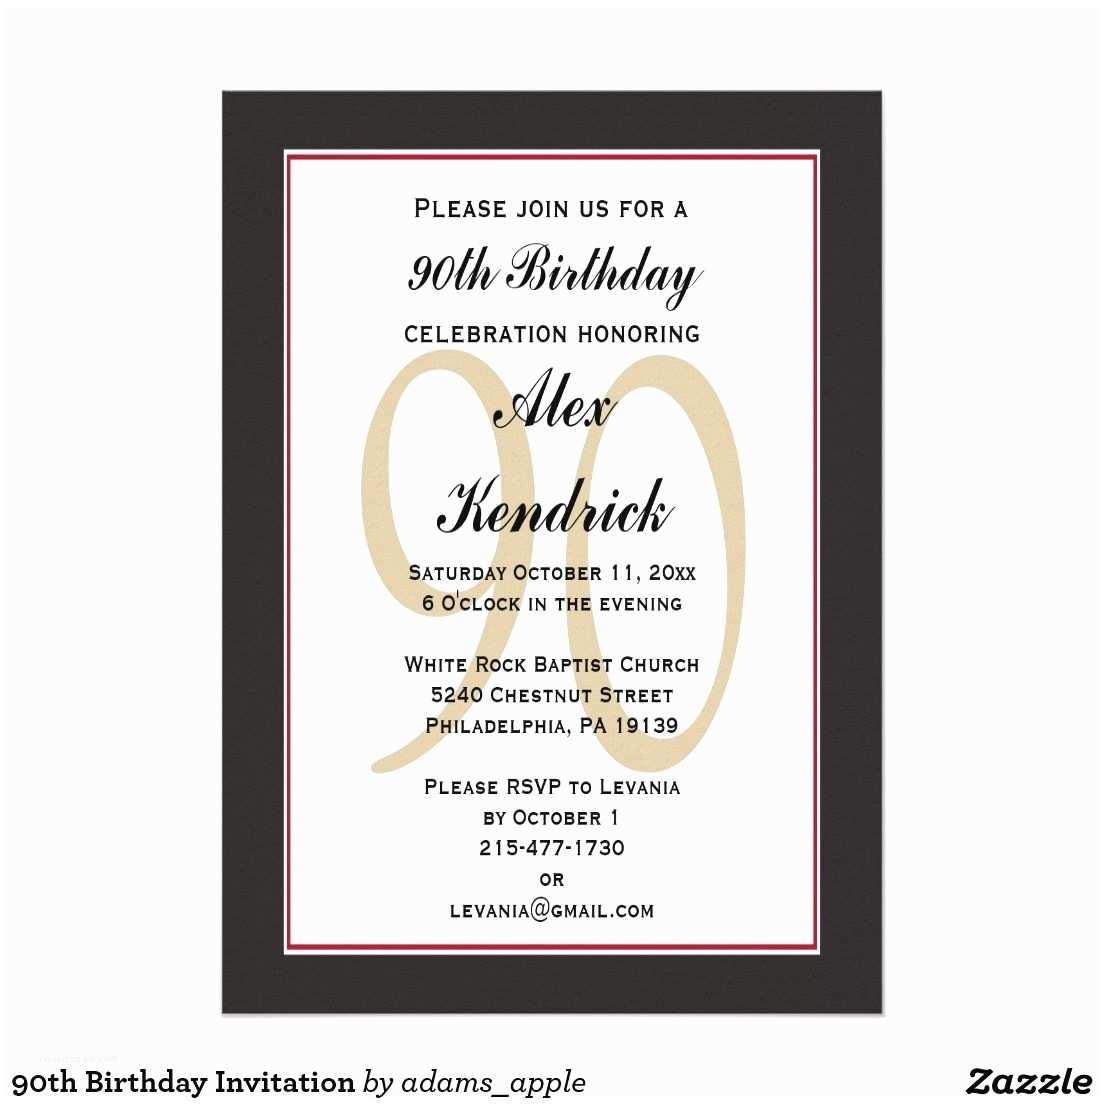 90th Birthday Invitations 90th Birthday Invitation